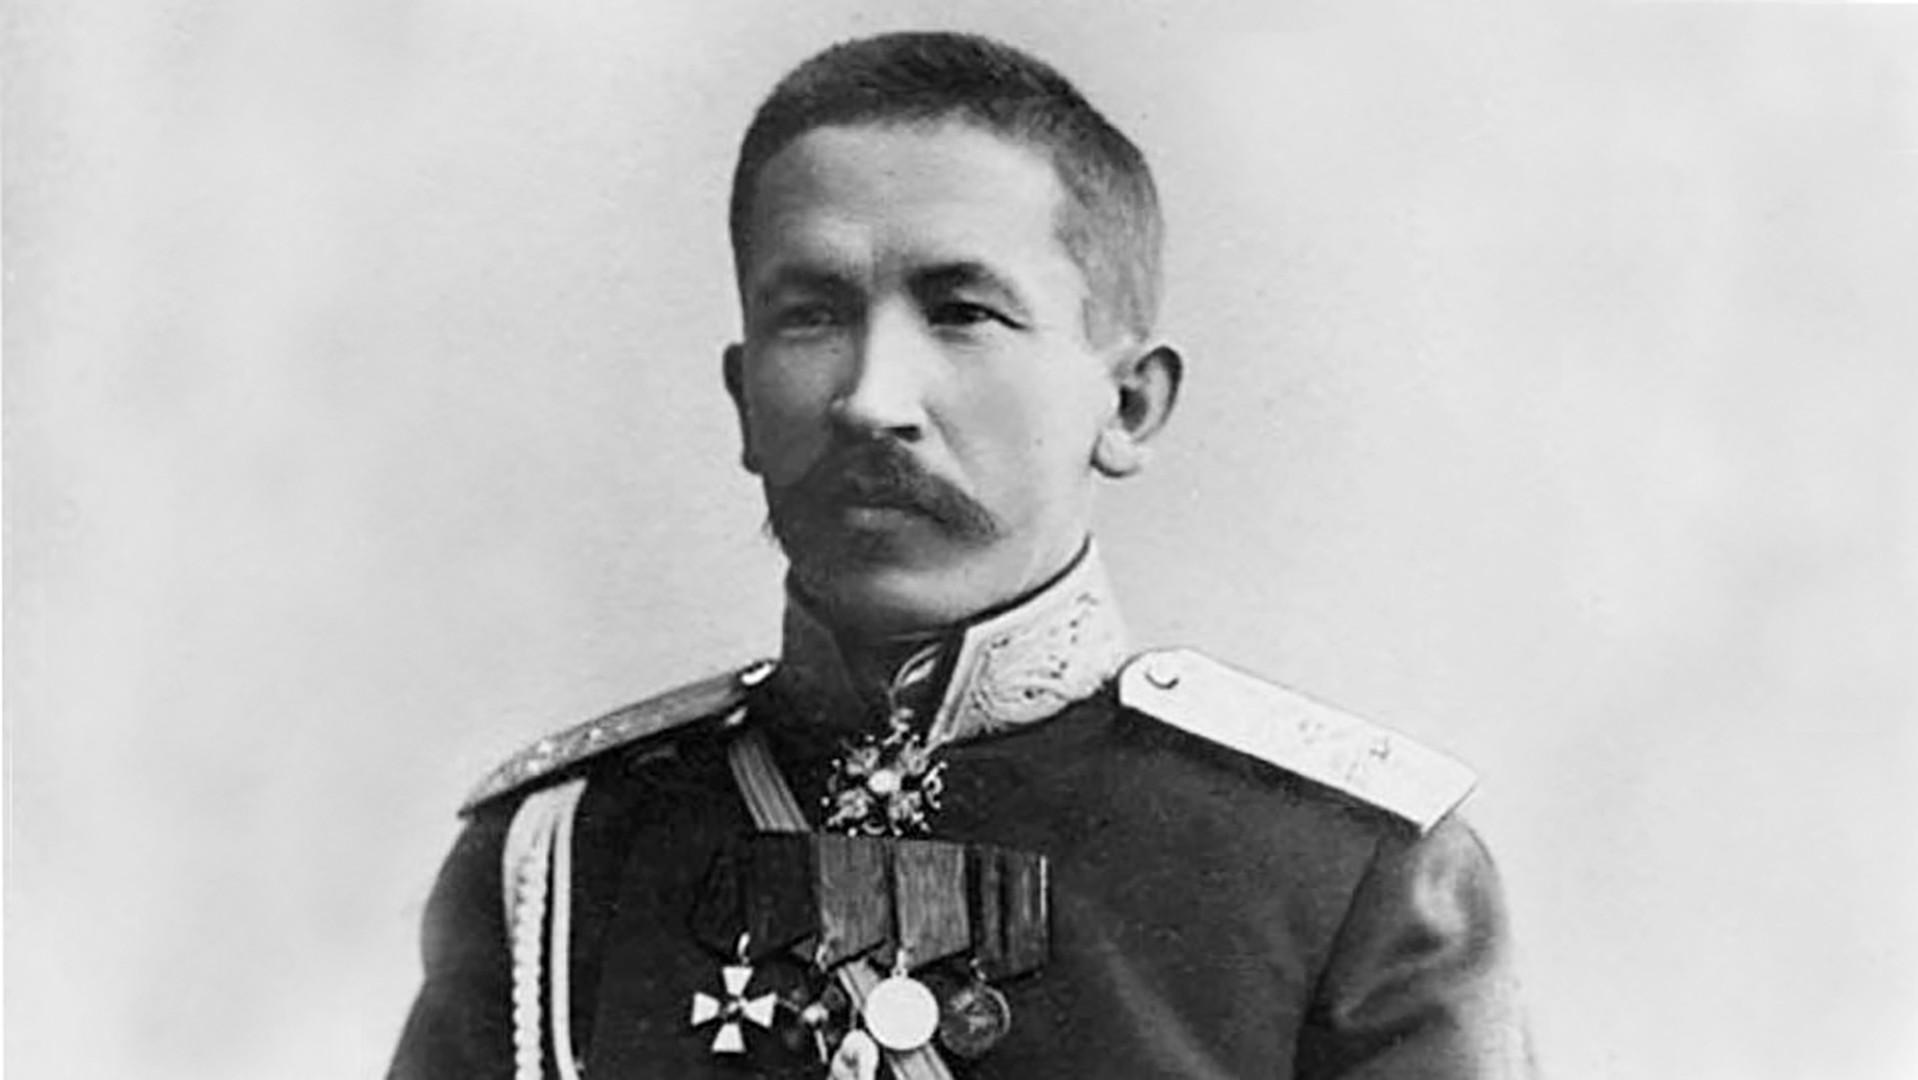 General Lawr Kornilow, 1916